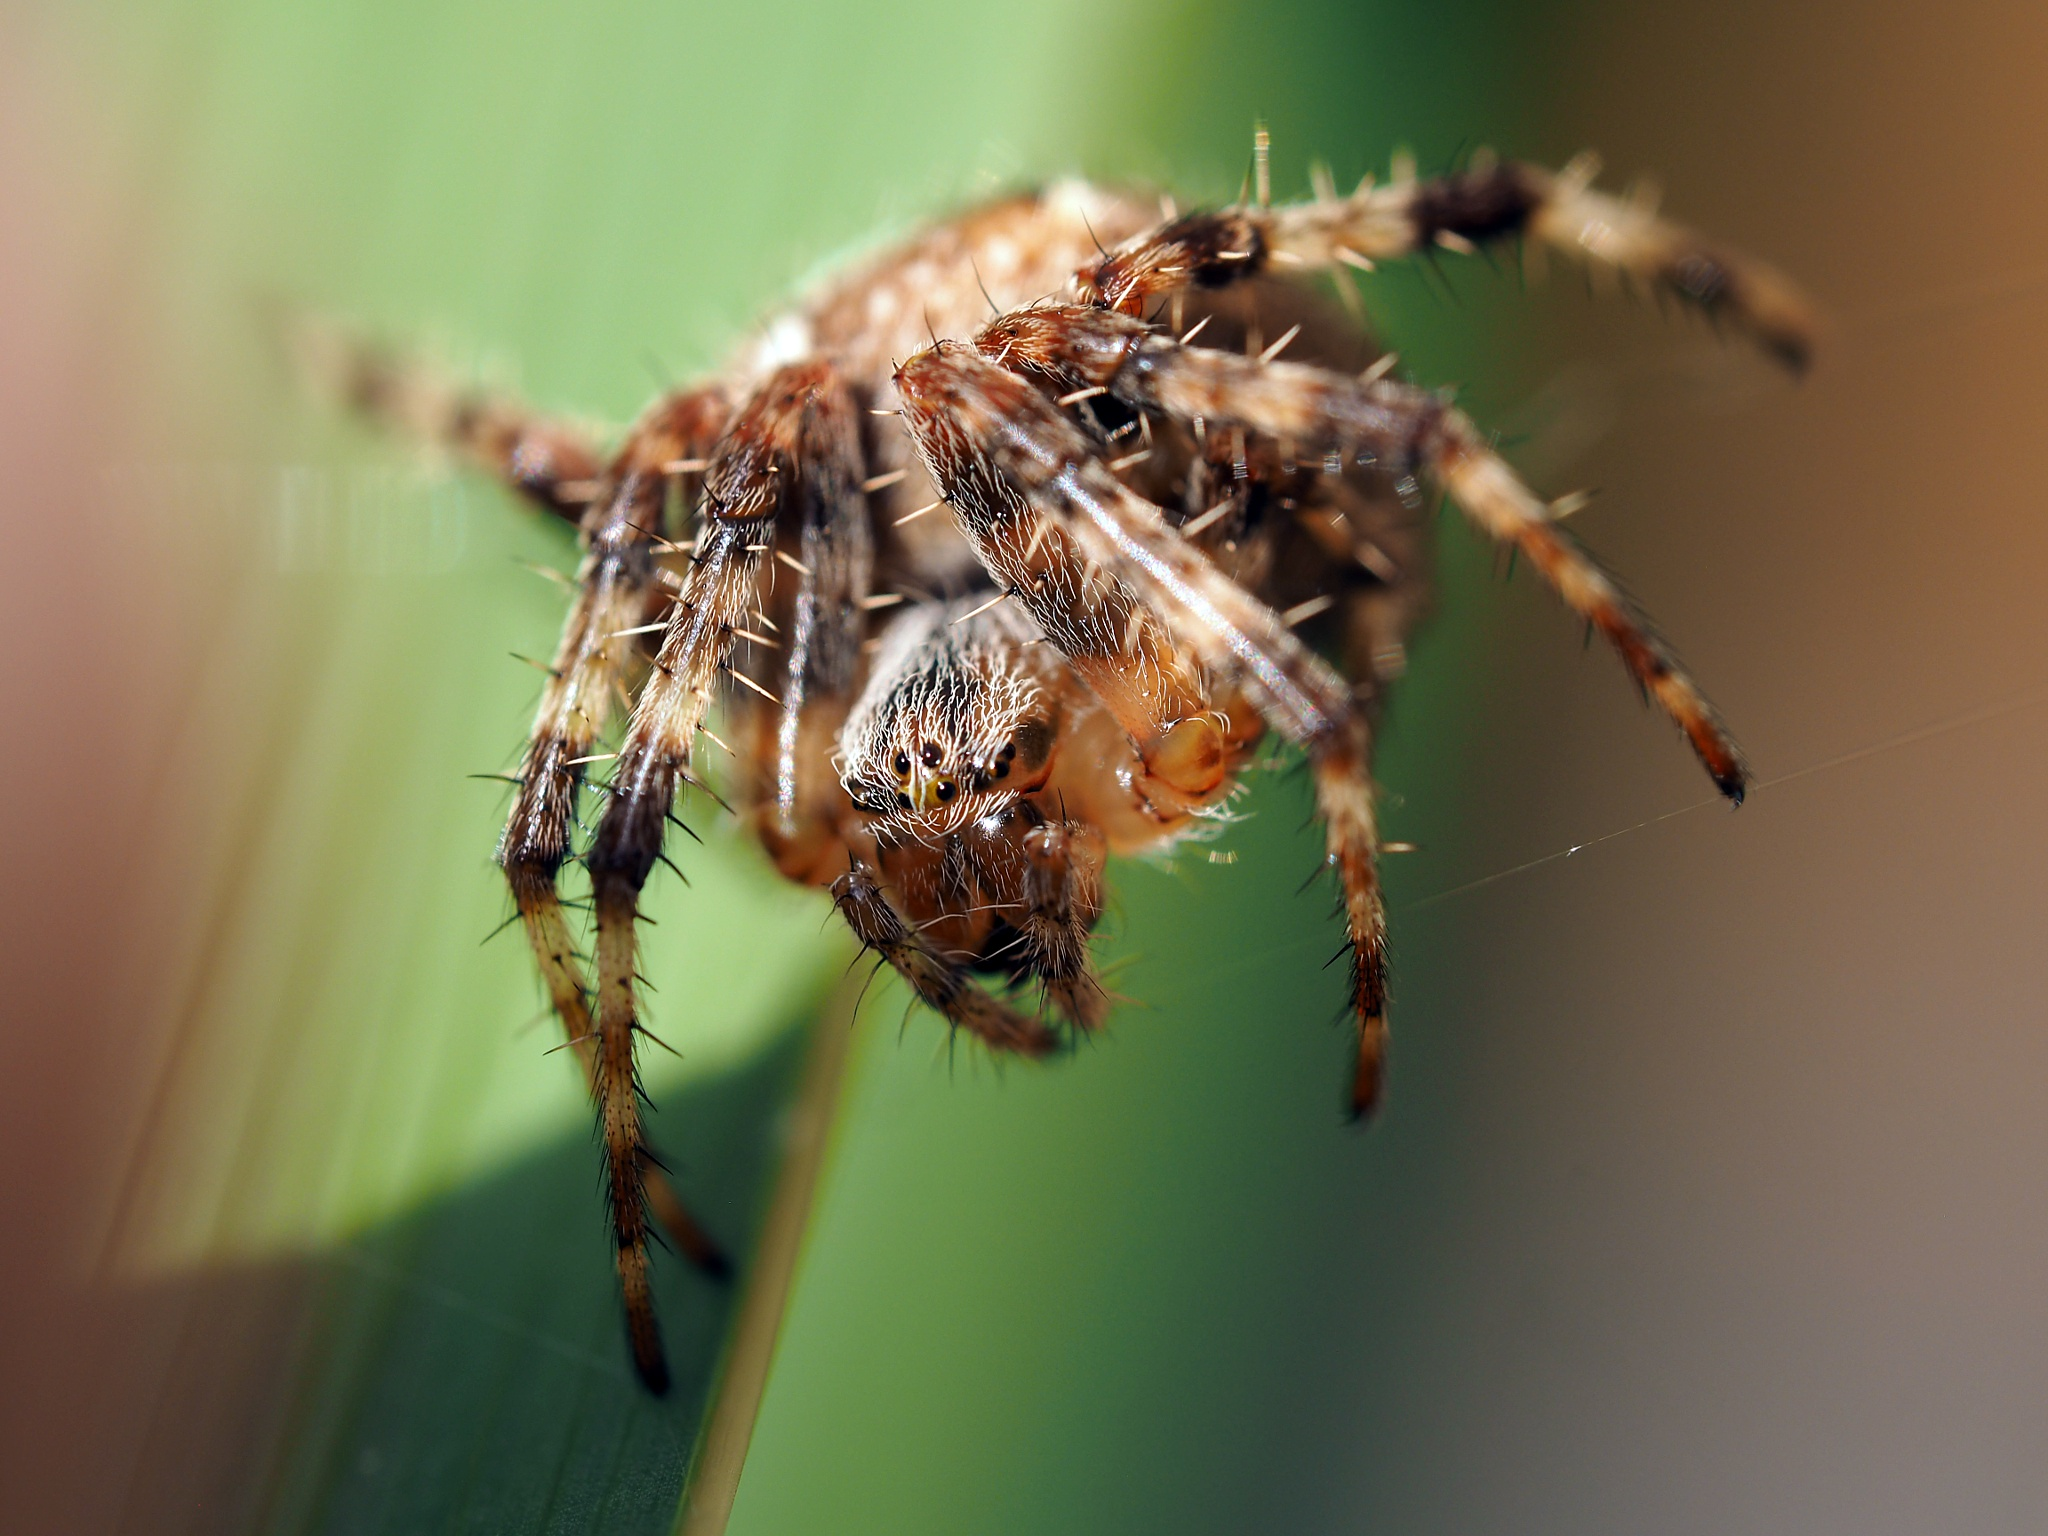 Spider by haydn.greenow